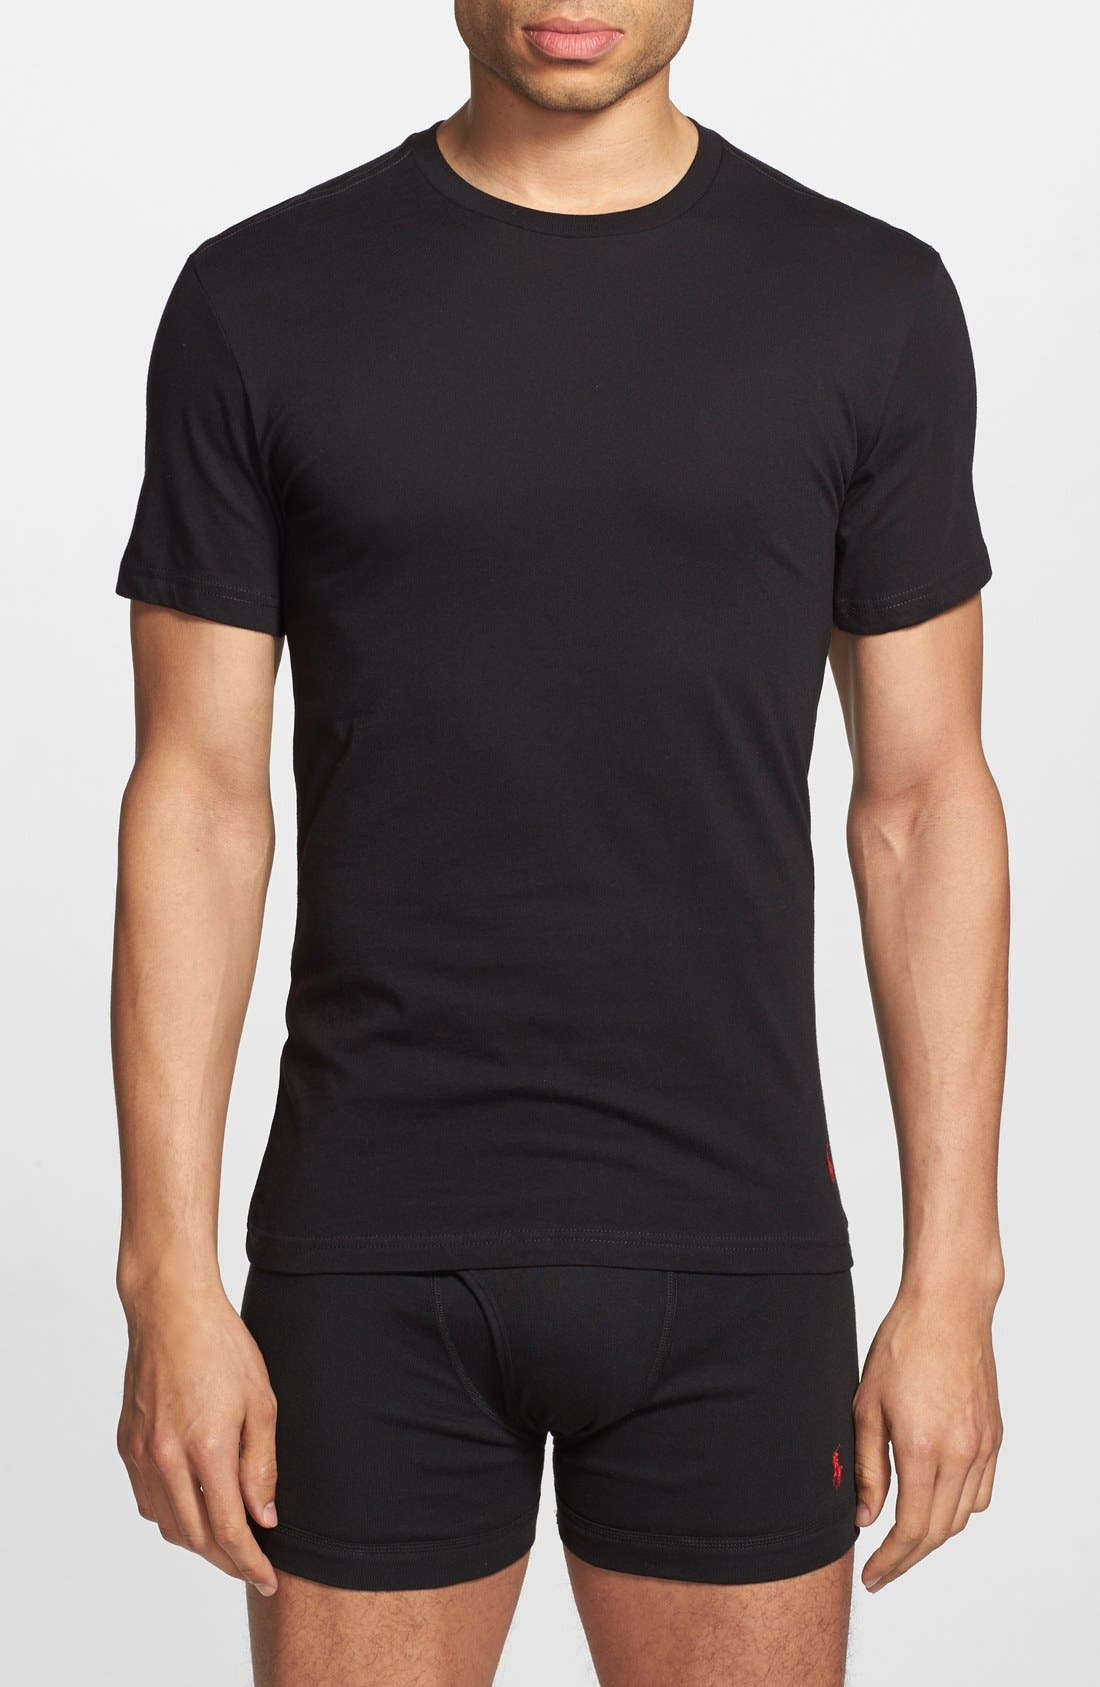 3-Pack Slim Fit T-Shirt,                             Alternate thumbnail 4, color,                             BLACK/ GREY/ CHARCOAL